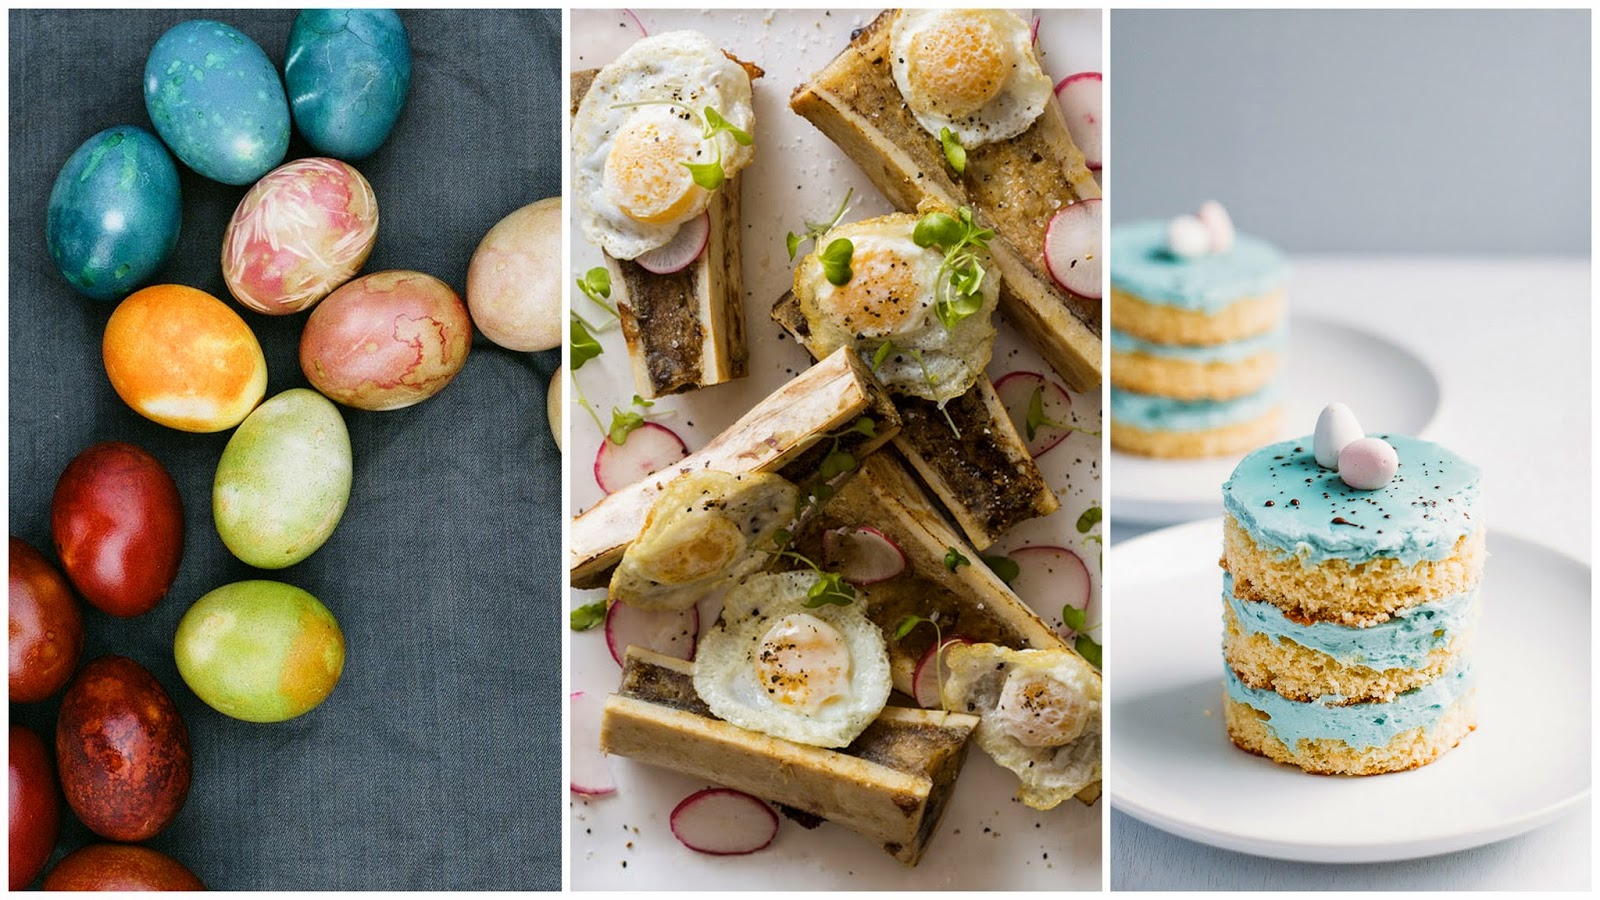 Natural Easter Egg Dyes, Egg Recipes, Robin's Egg Cakes